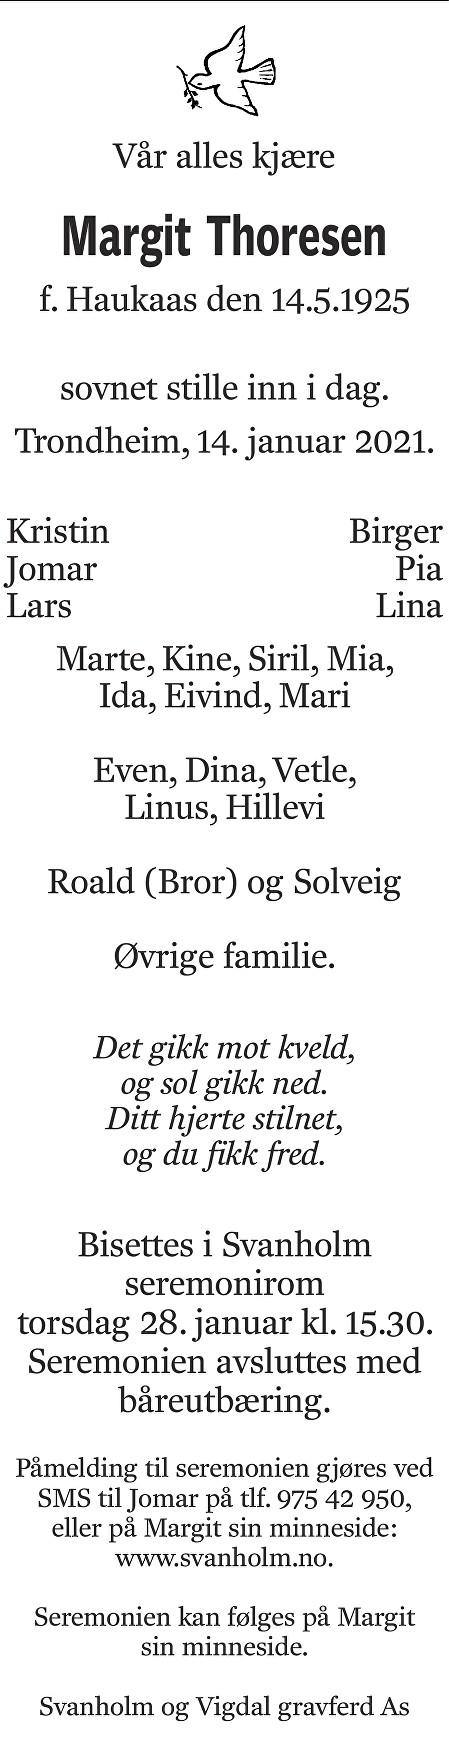 Margit Thoresen Dødsannonse